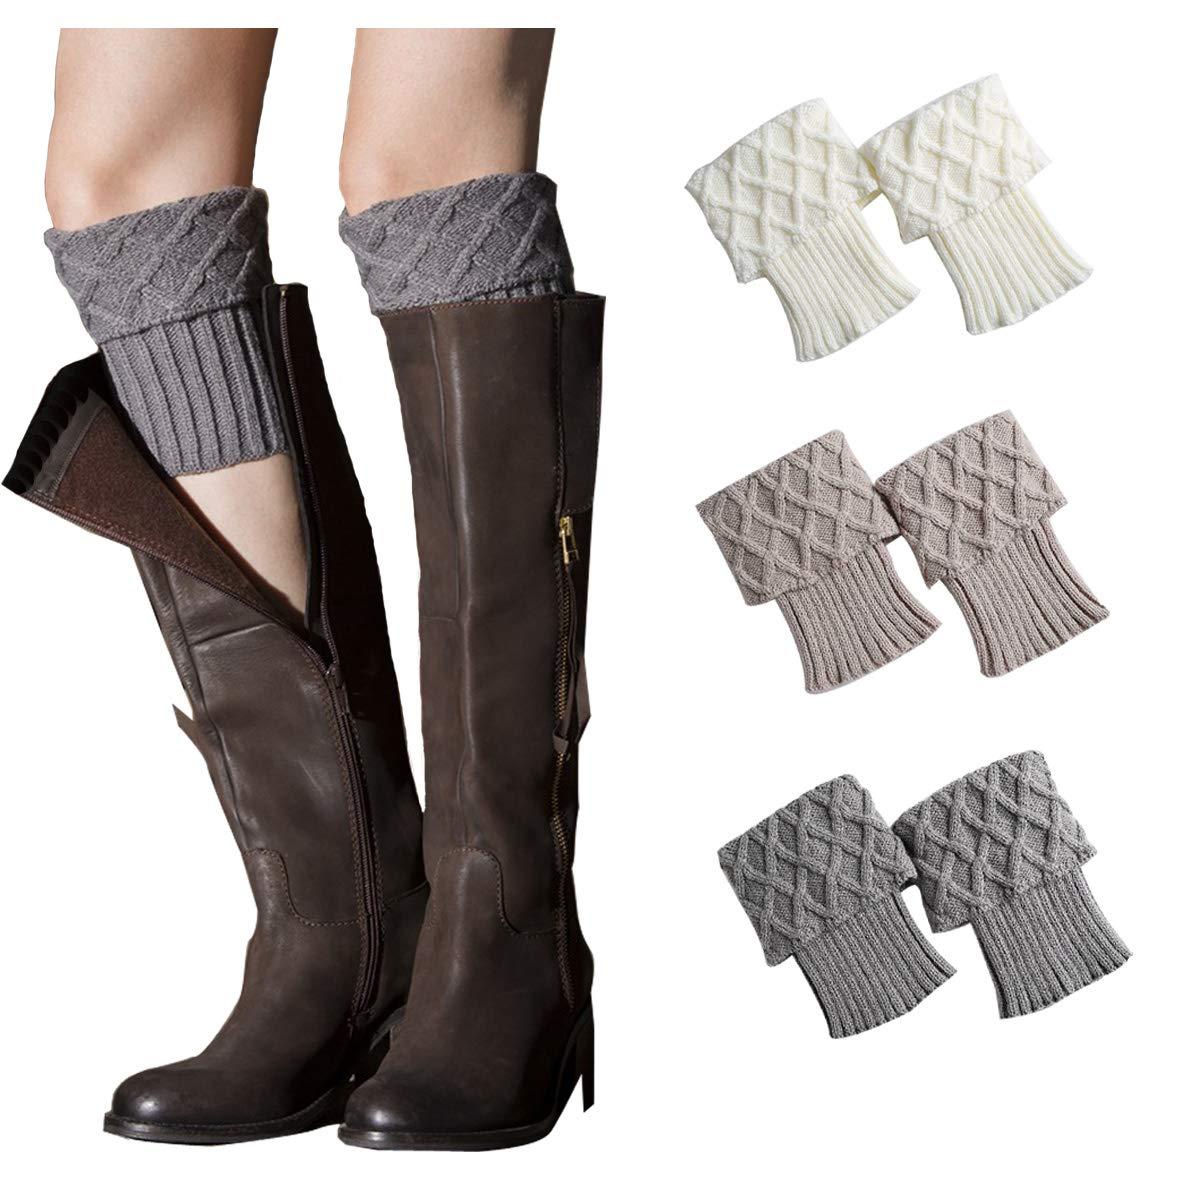 e34beb4411 Womens Leg Warmers Crochet Boot Socks Topper Cuffs (One size